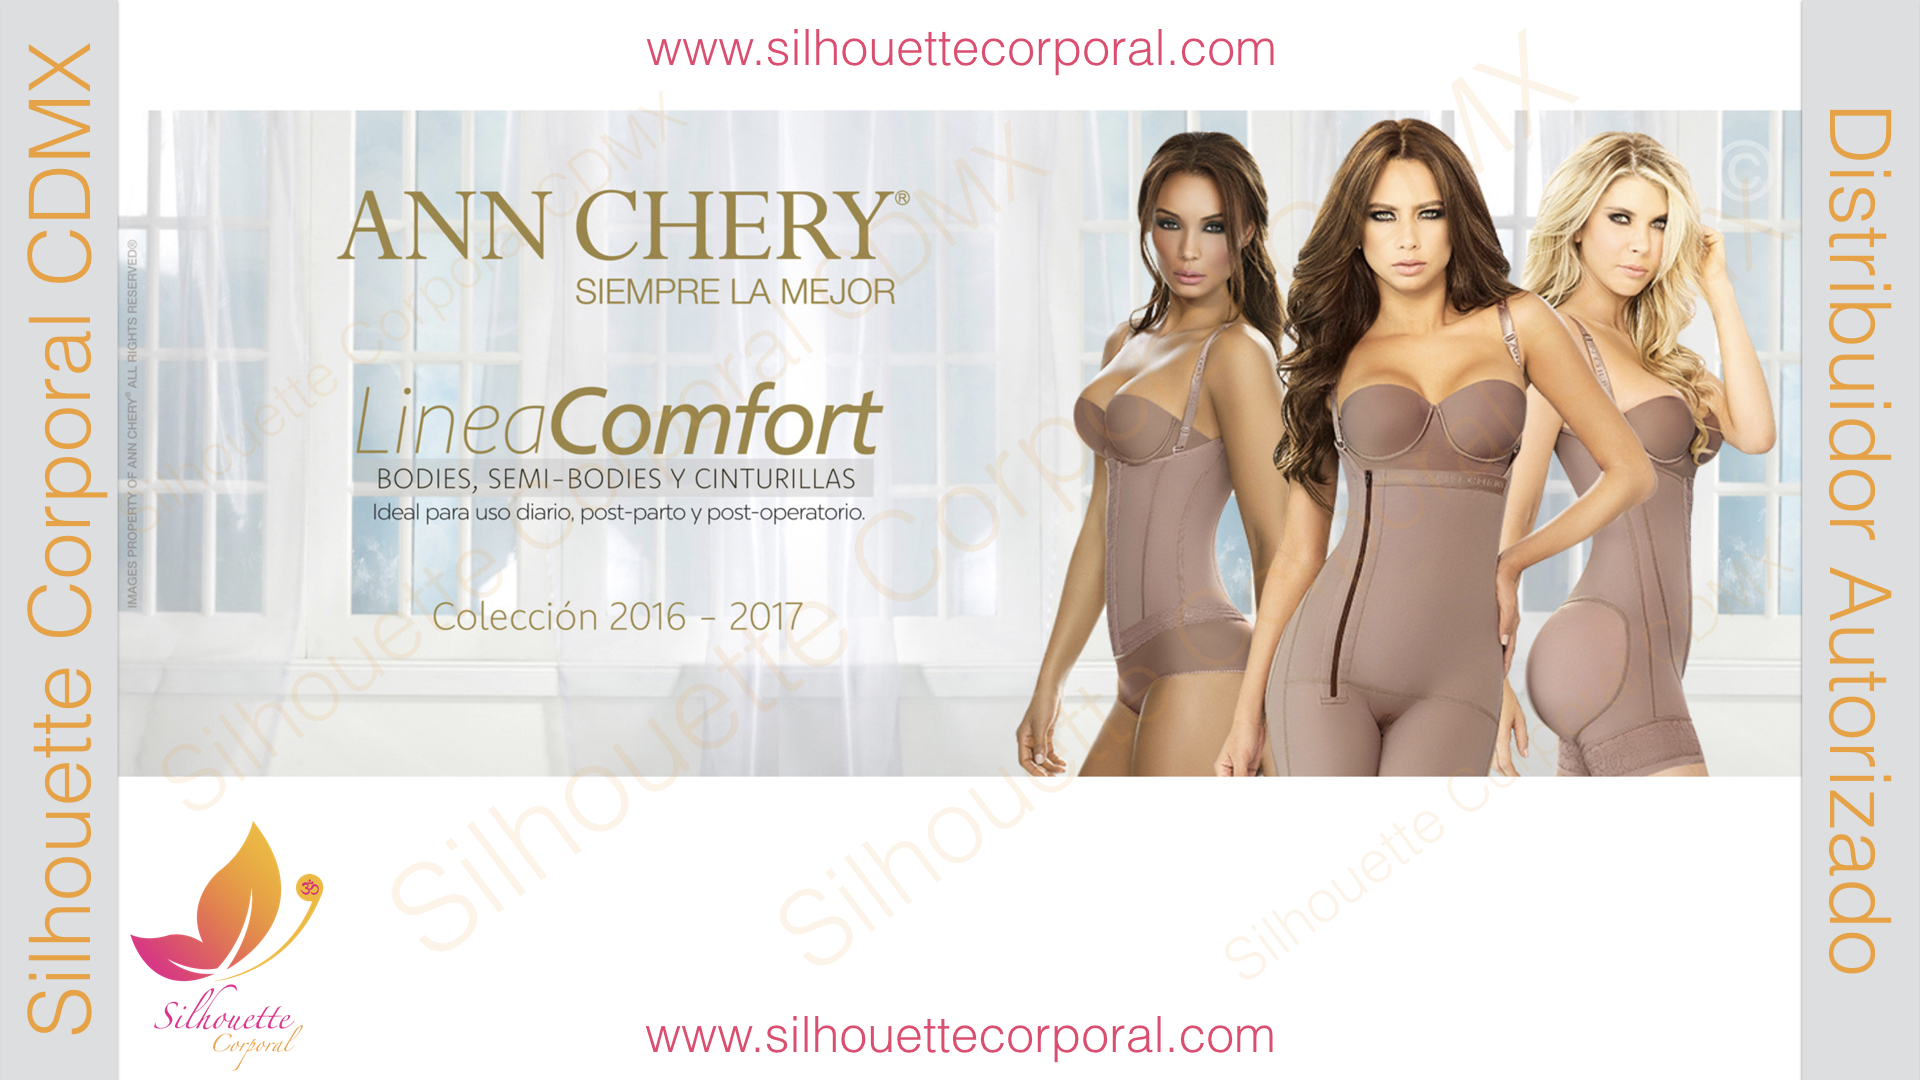 Ann Chery MX - Línea Comfort